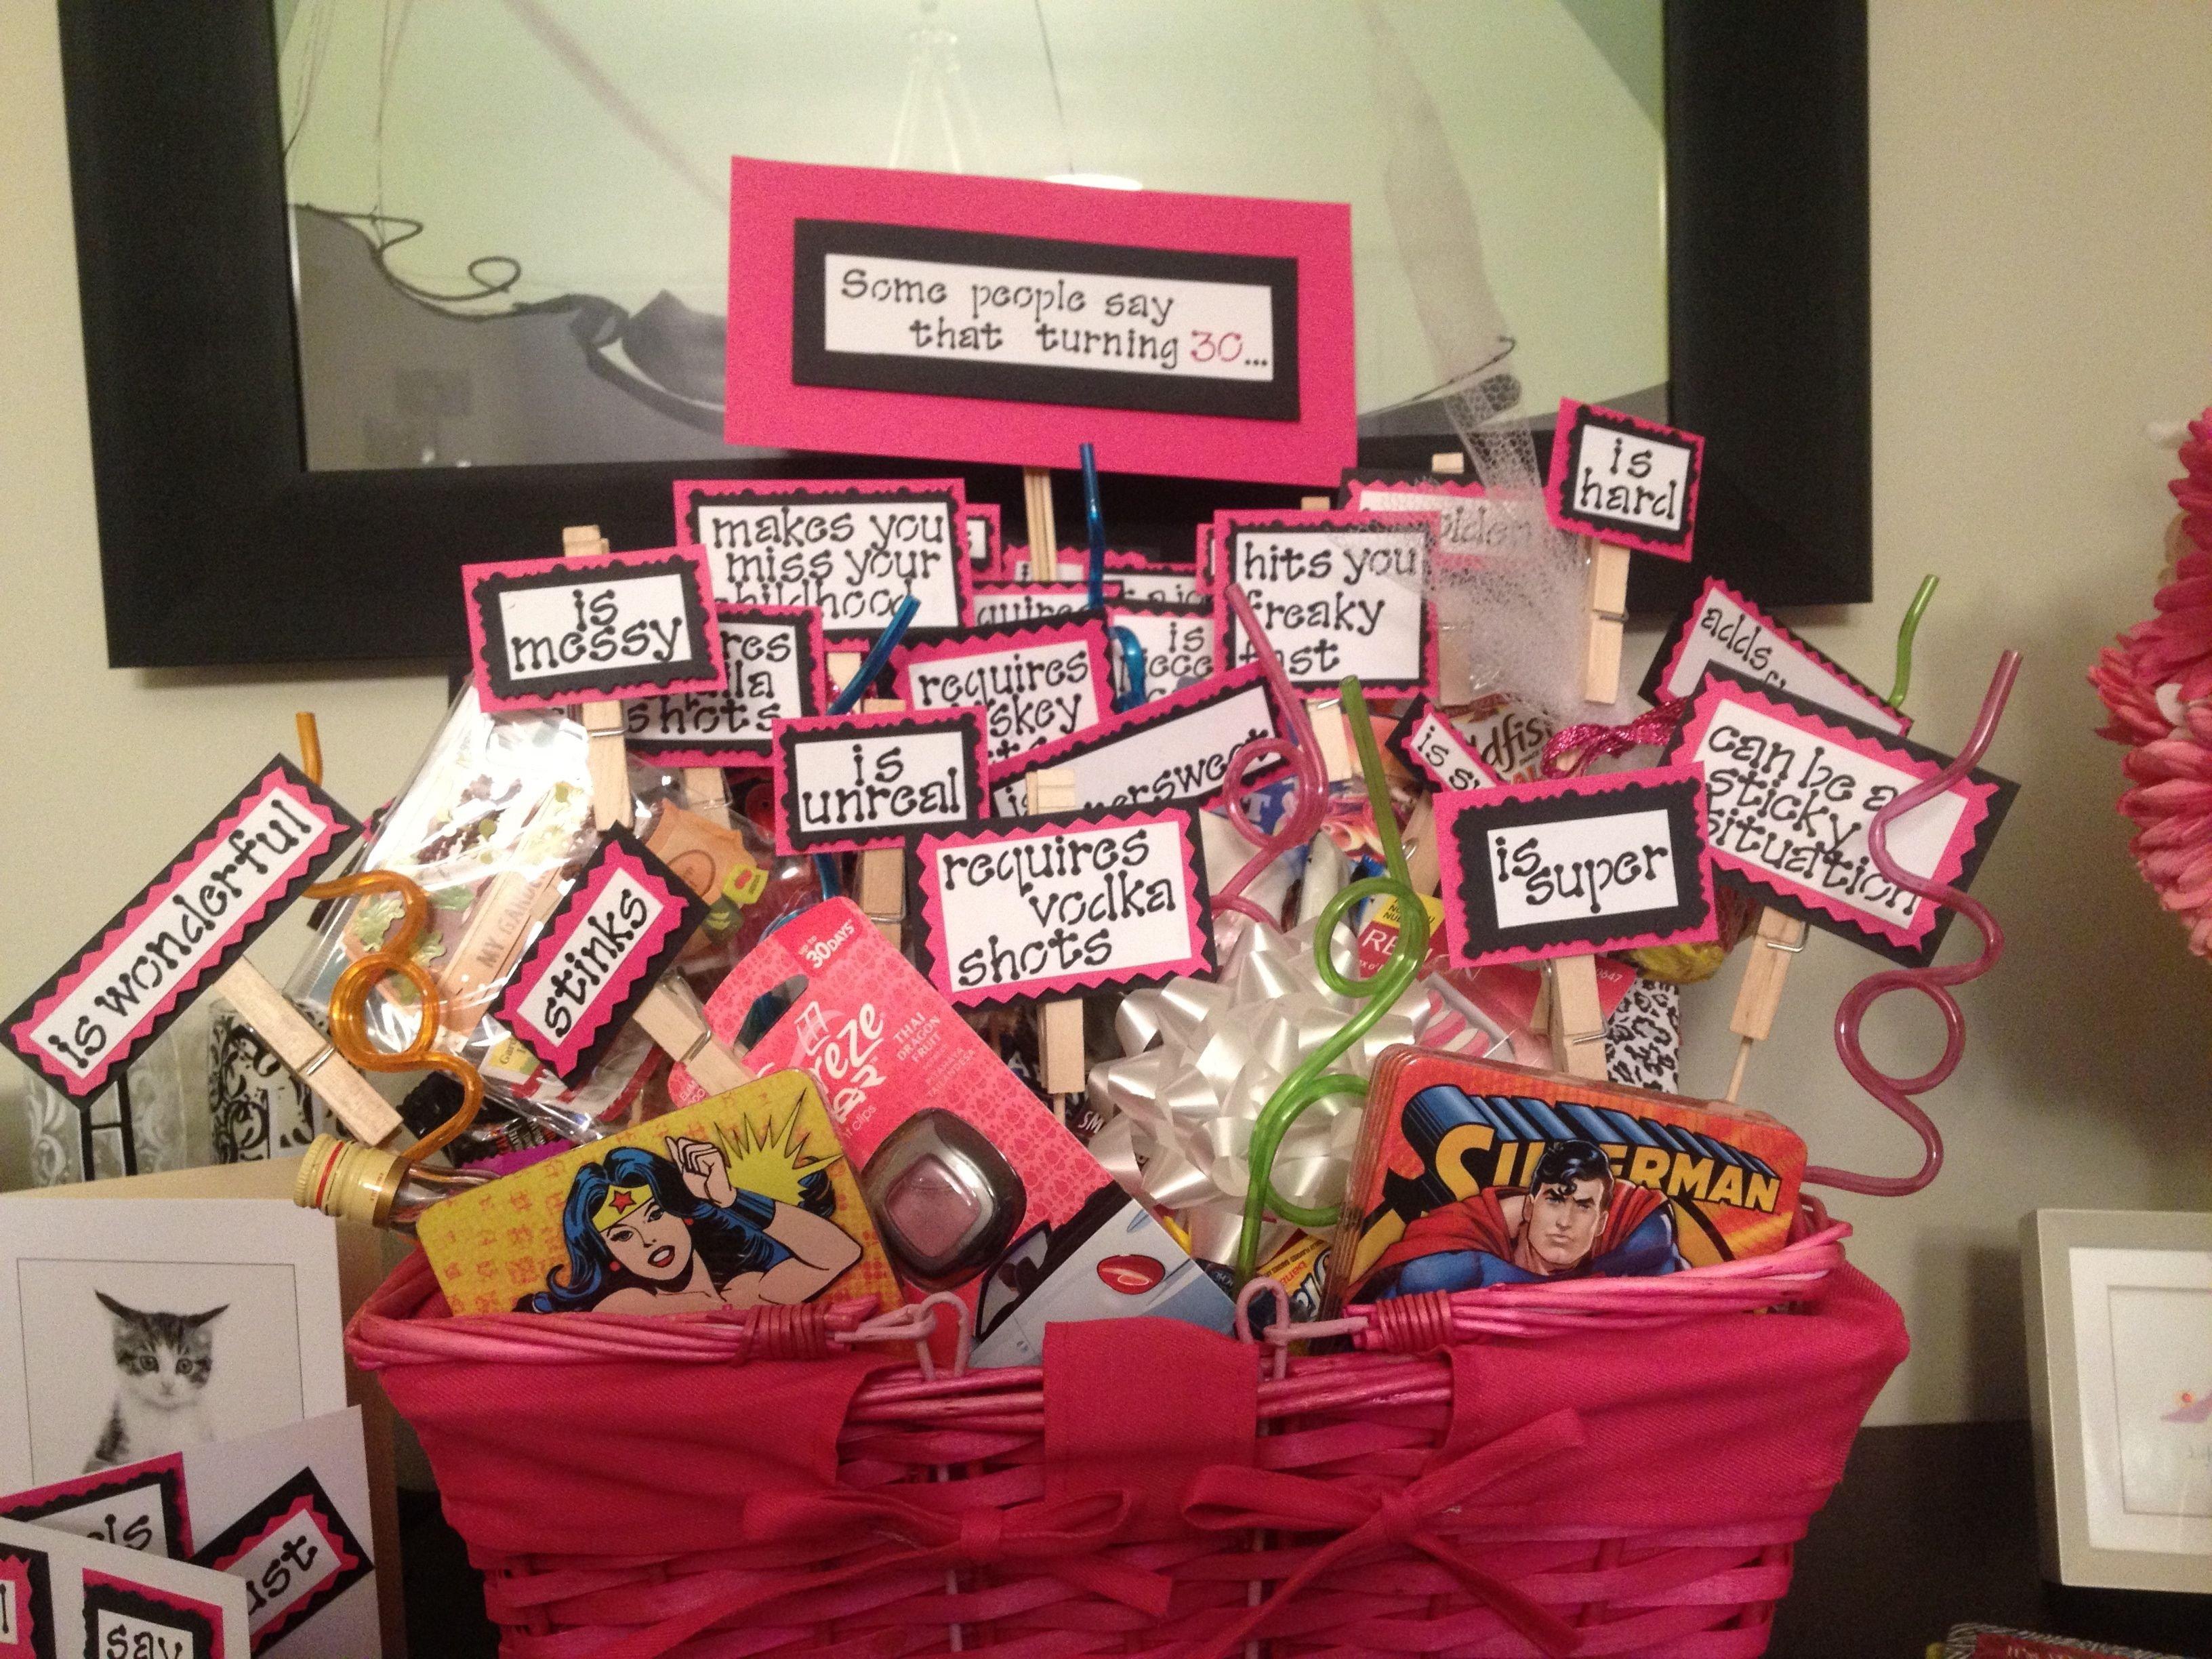 10 Fashionable Creative 30Th Birthday Gift Ideas For Her turning 30 birthday basket basket ideas 30 birthday and dear friend 2 2020